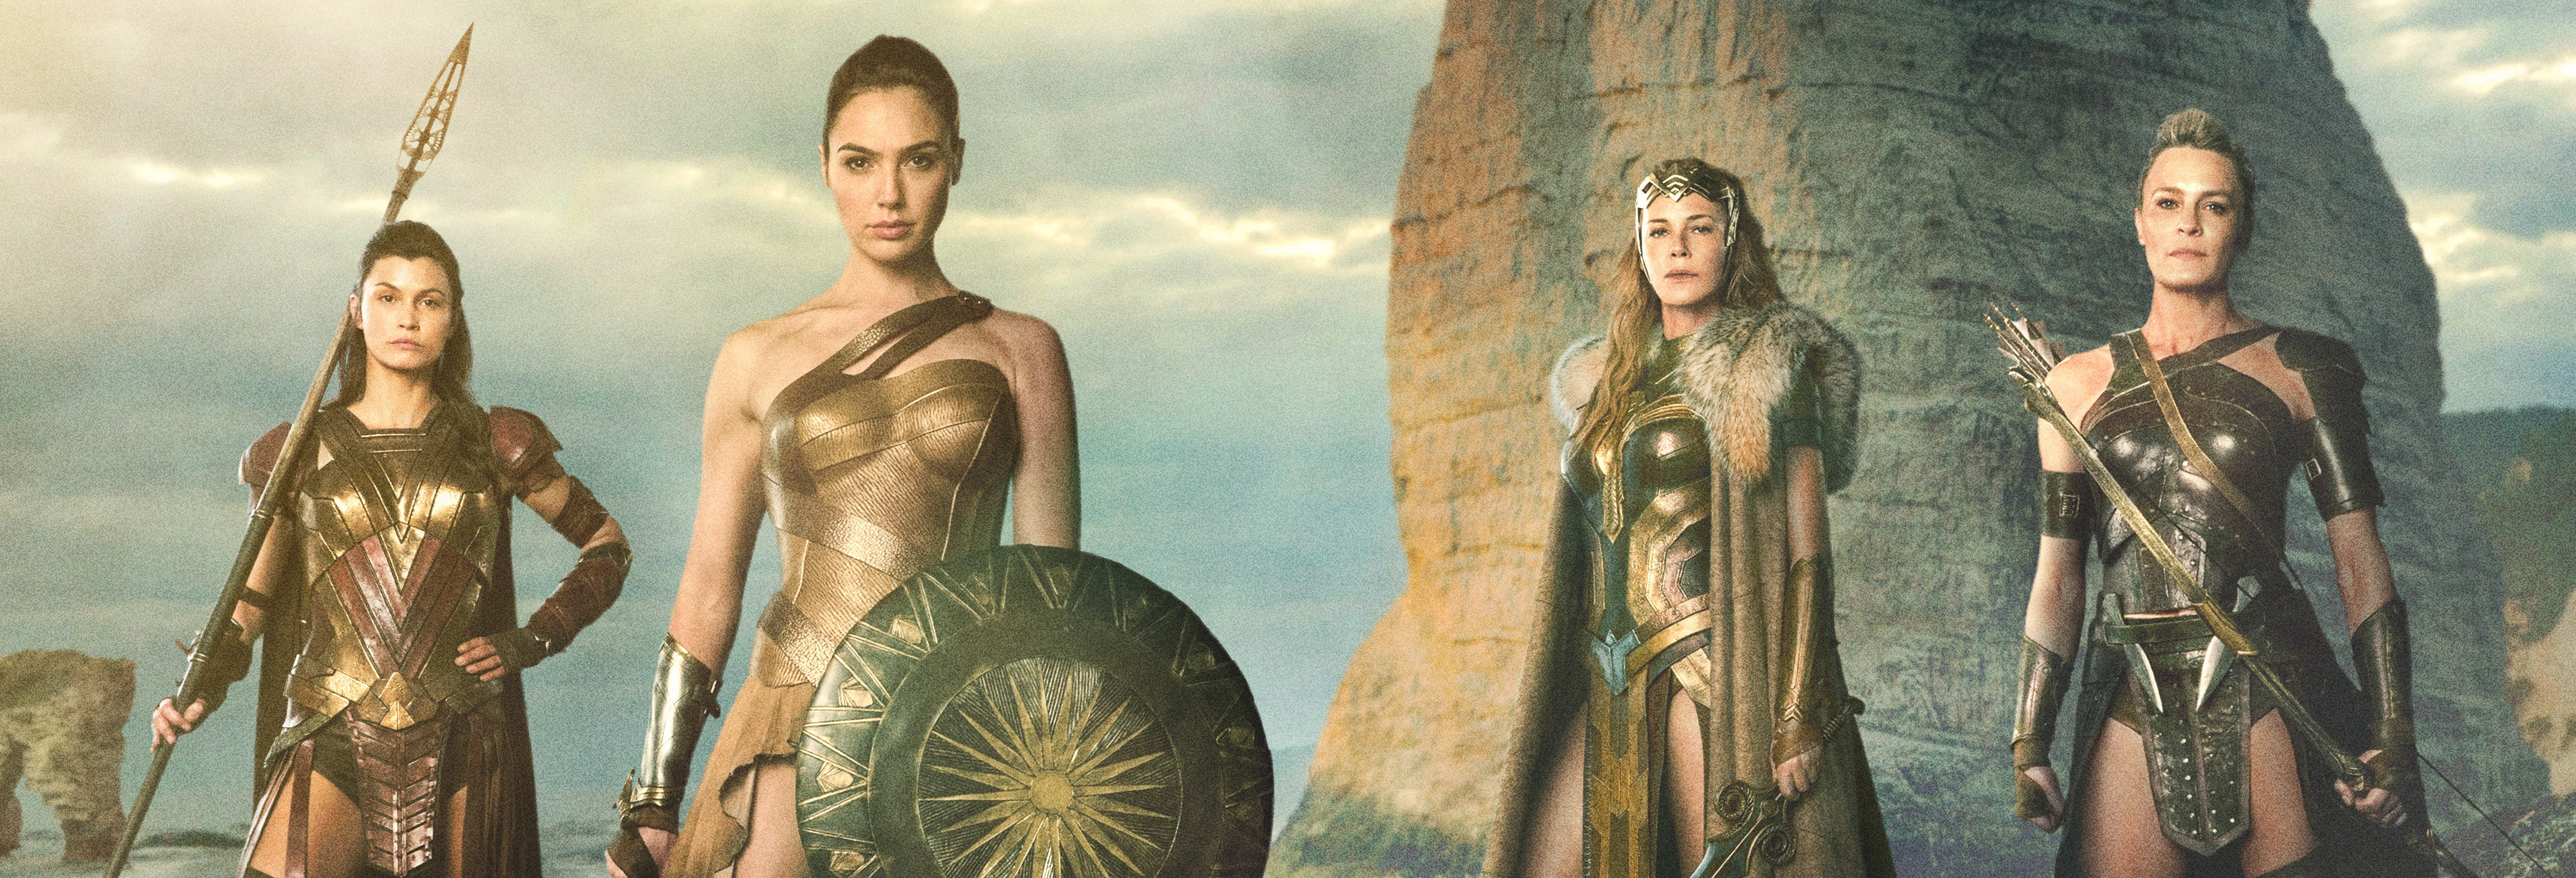 szmk_wonder_woman_movie_banner.jpg